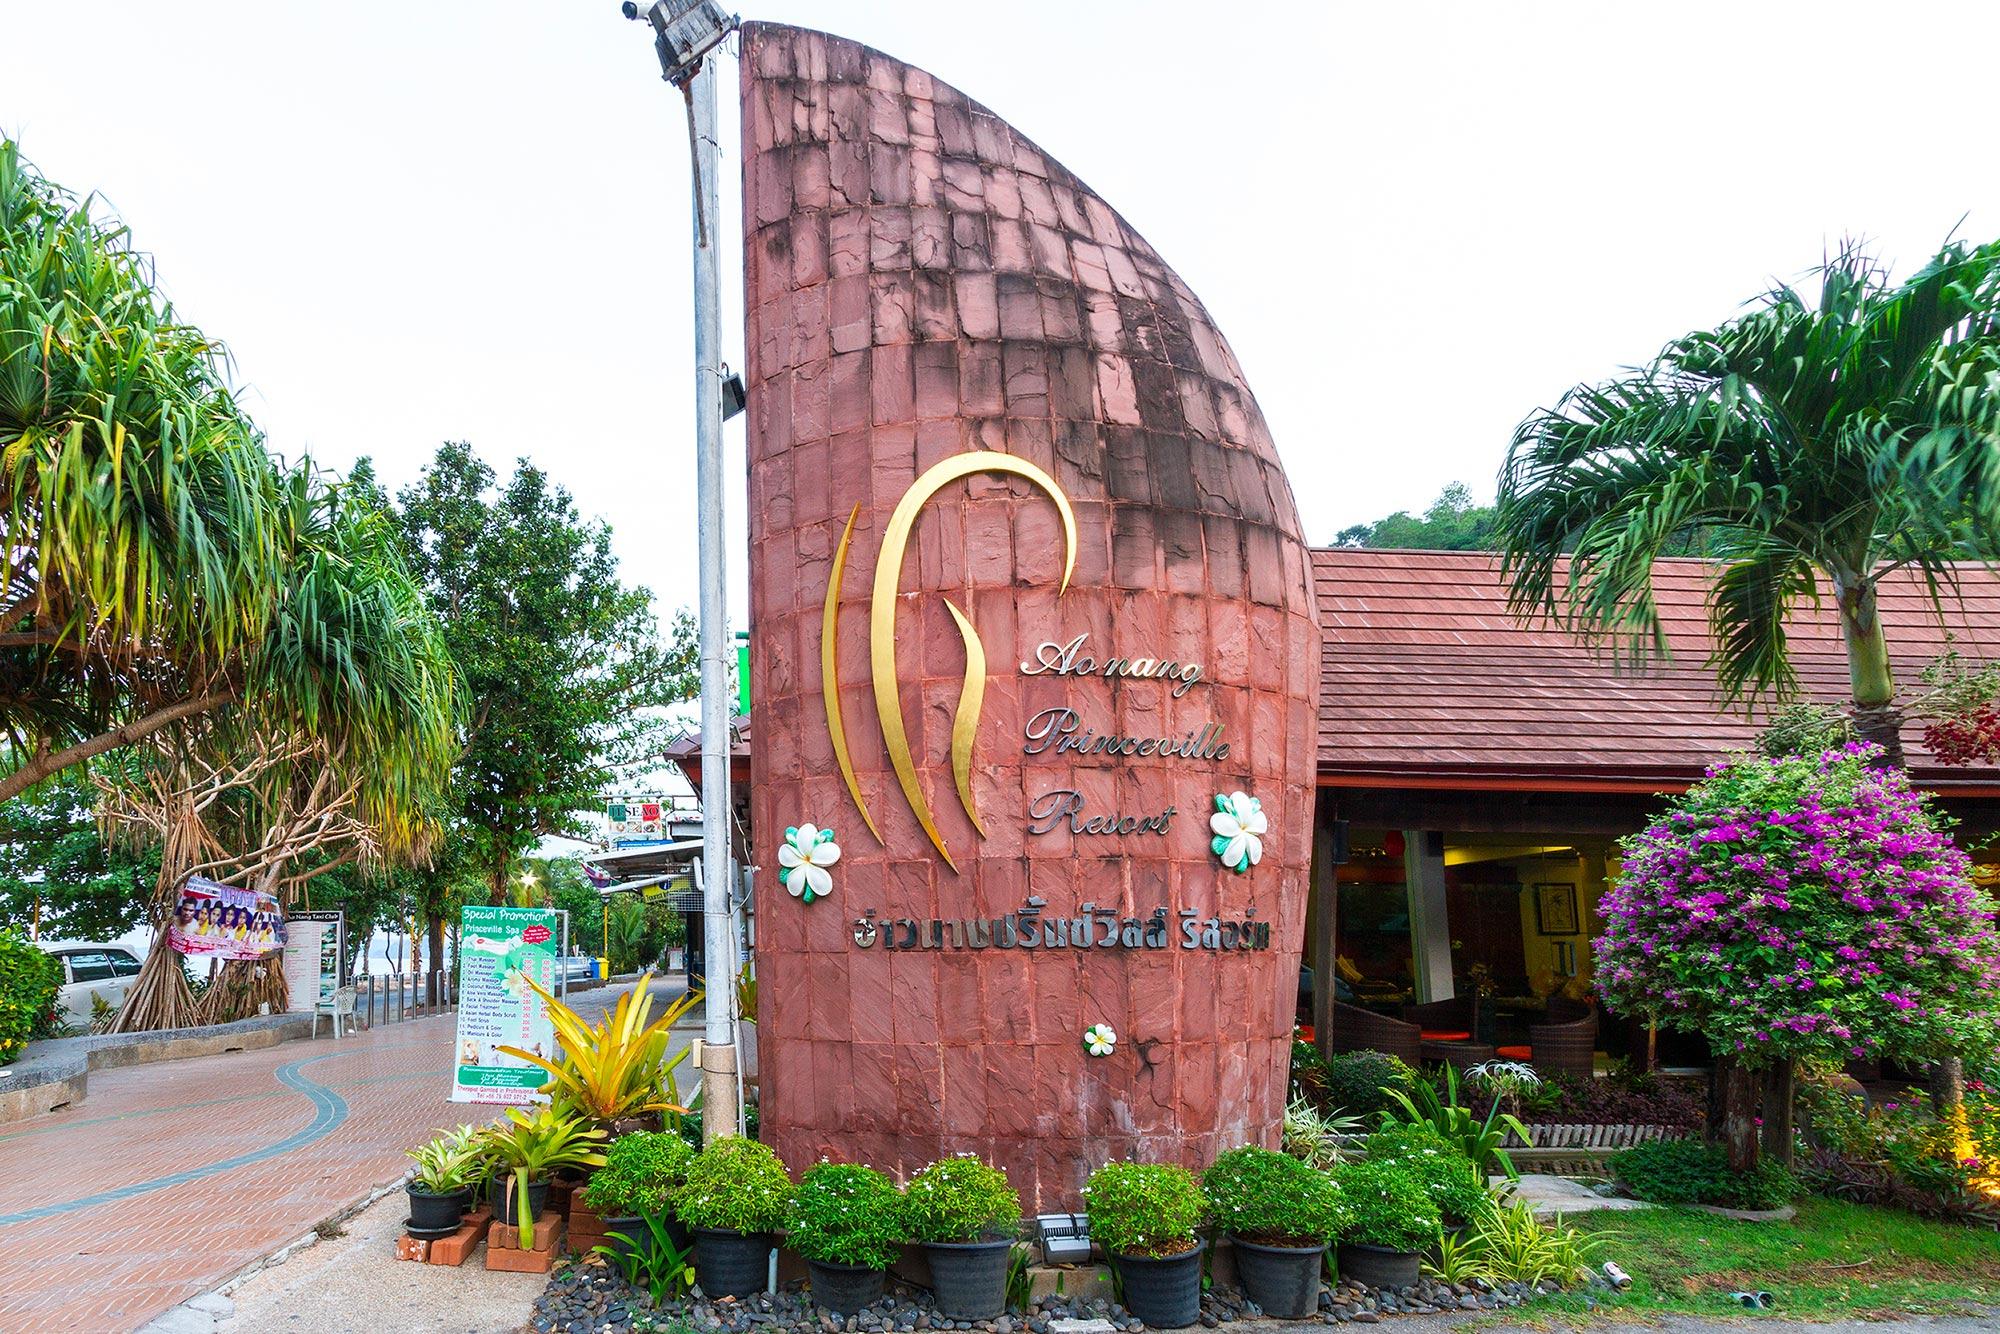 Aonang Princeville Resort and Spa  อ่าวนาง ปริ๊นซ์วิลล์ รีสอร์ท แอนด์ สปา Aonang Princeville Resort IMG 0301